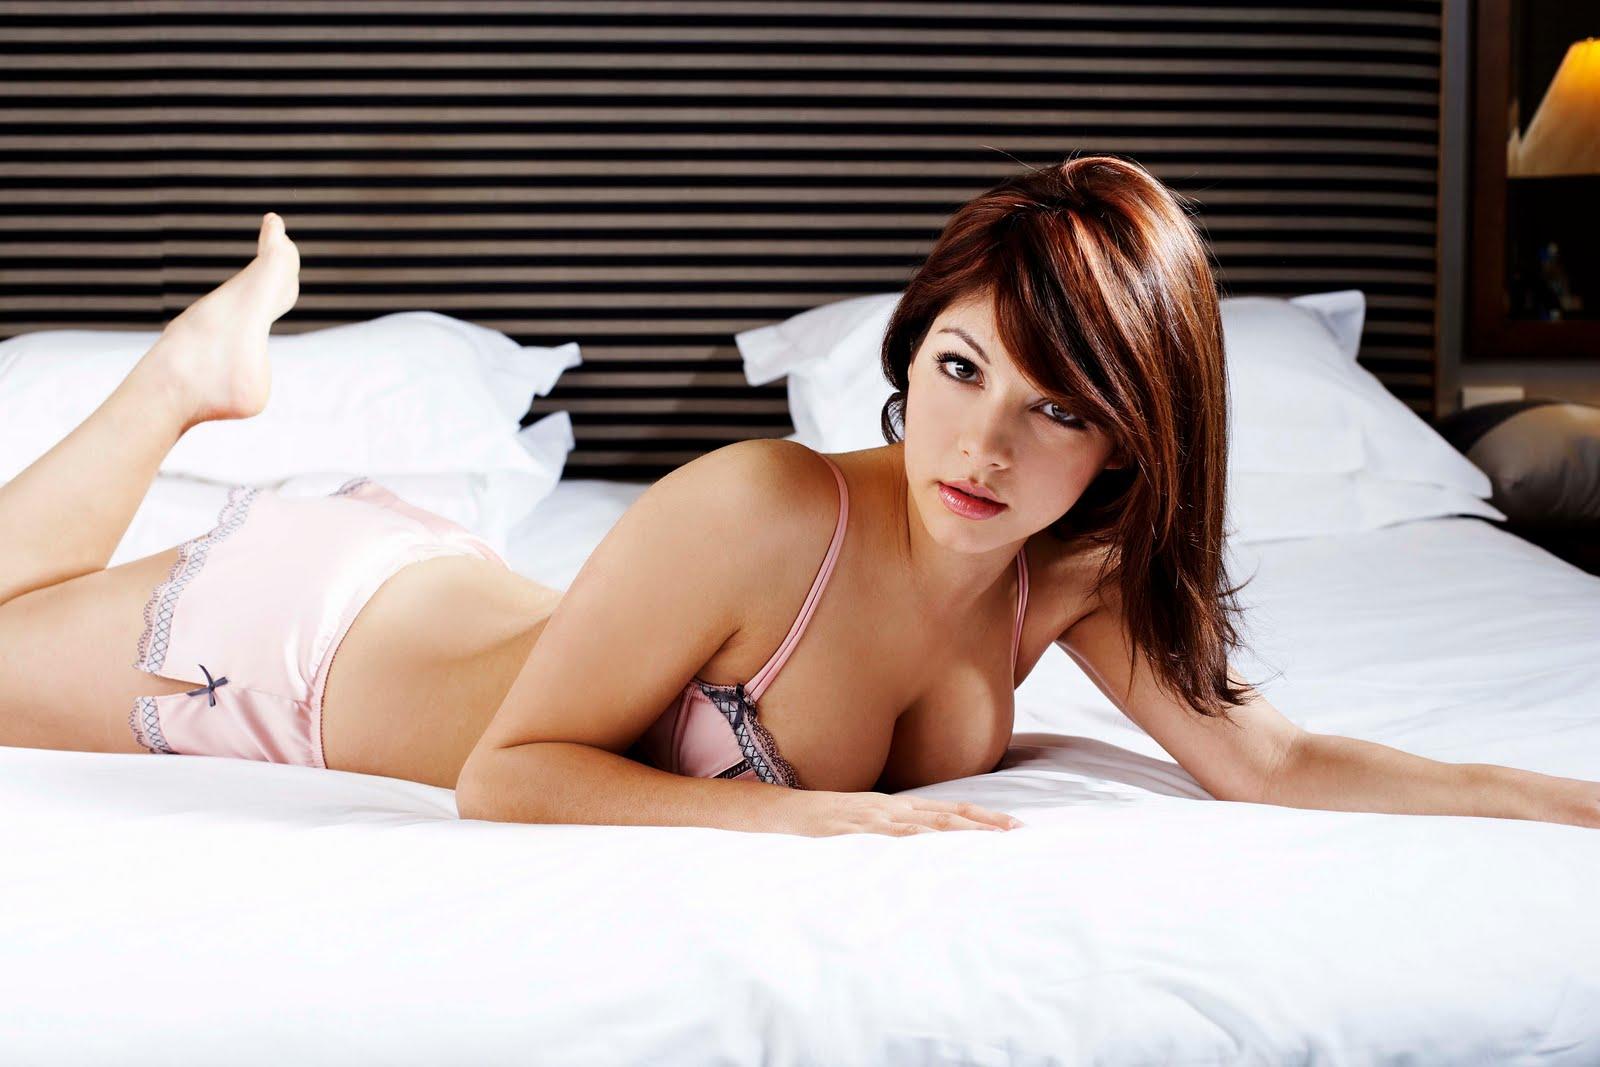 http://3.bp.blogspot.com/-hqOjoR24WQc/TevqzlSfNzI/AAAAAAAASME/Fml8s23ch8c/s1600/Roxanne%2BPallett10.jpg